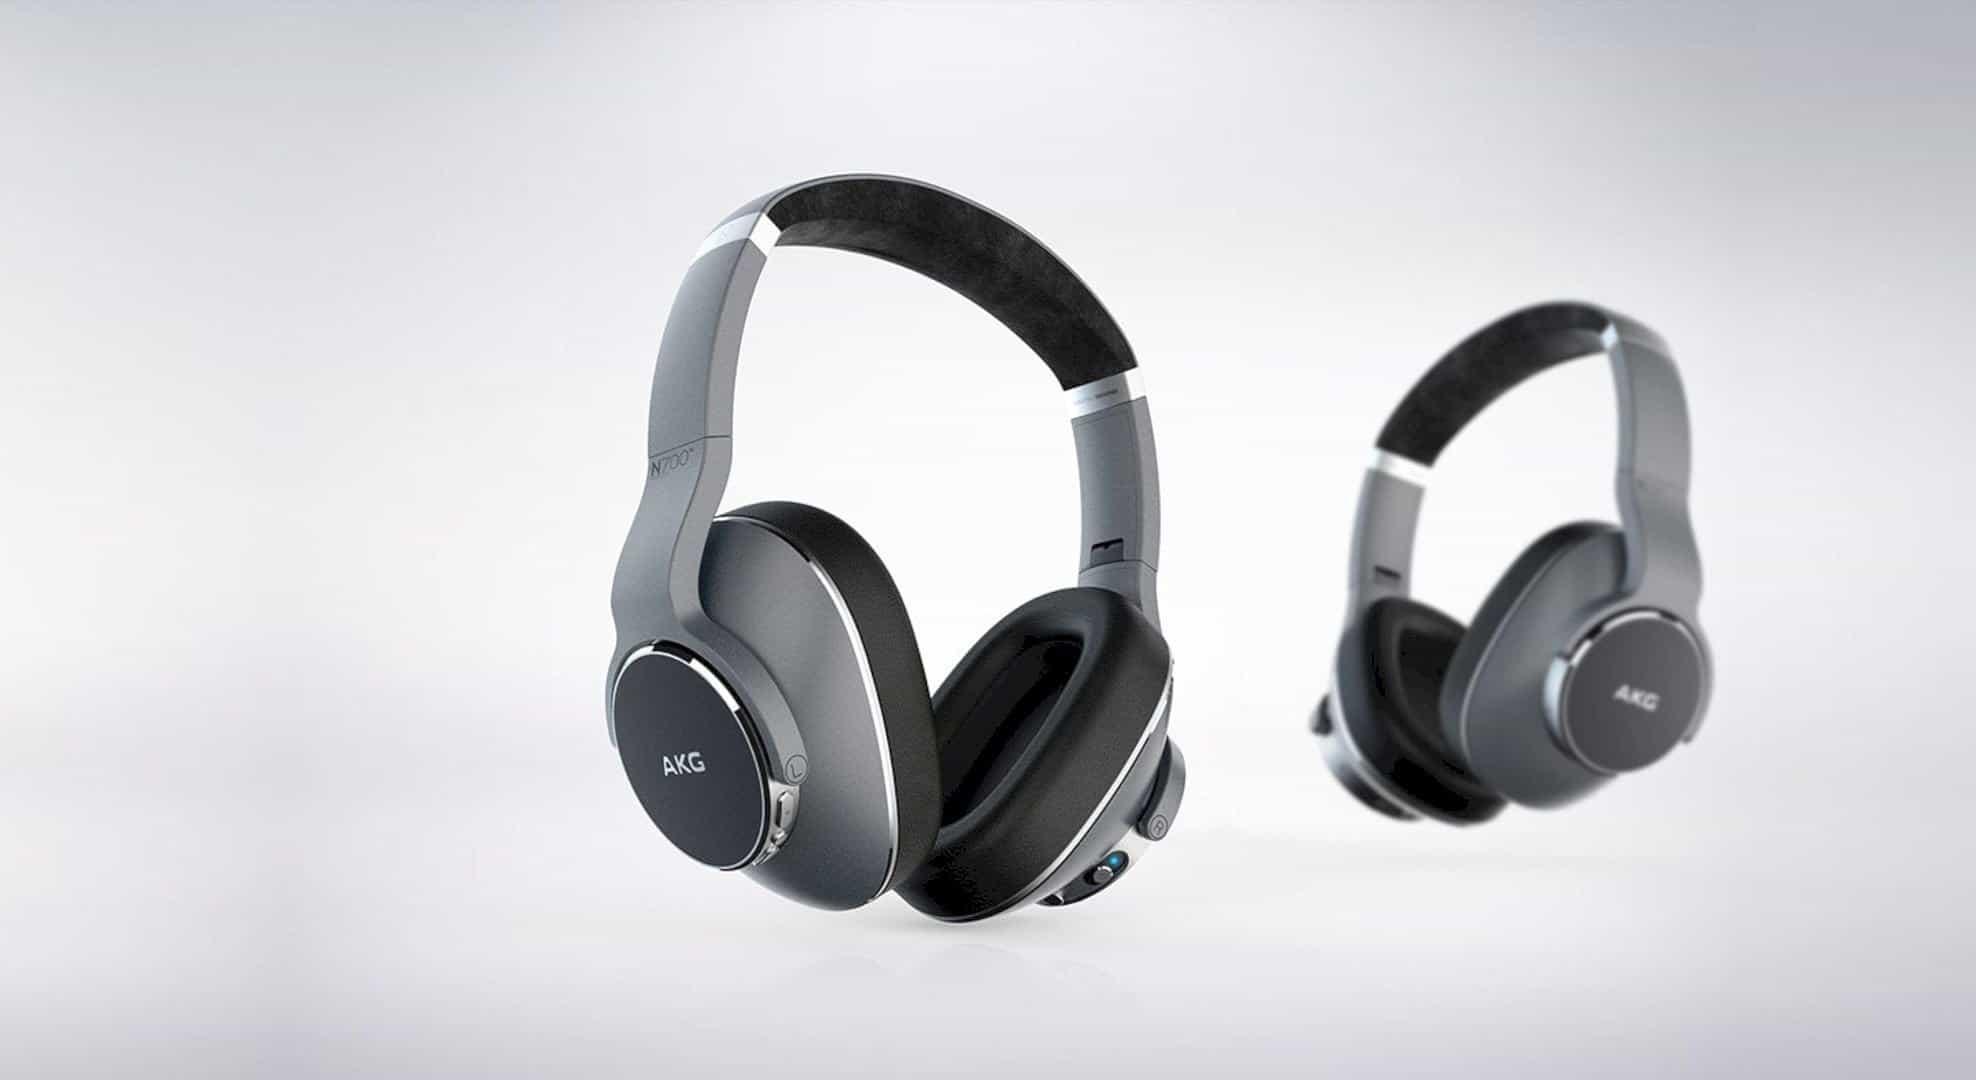 Samsung Akg Wireless Headphones 6